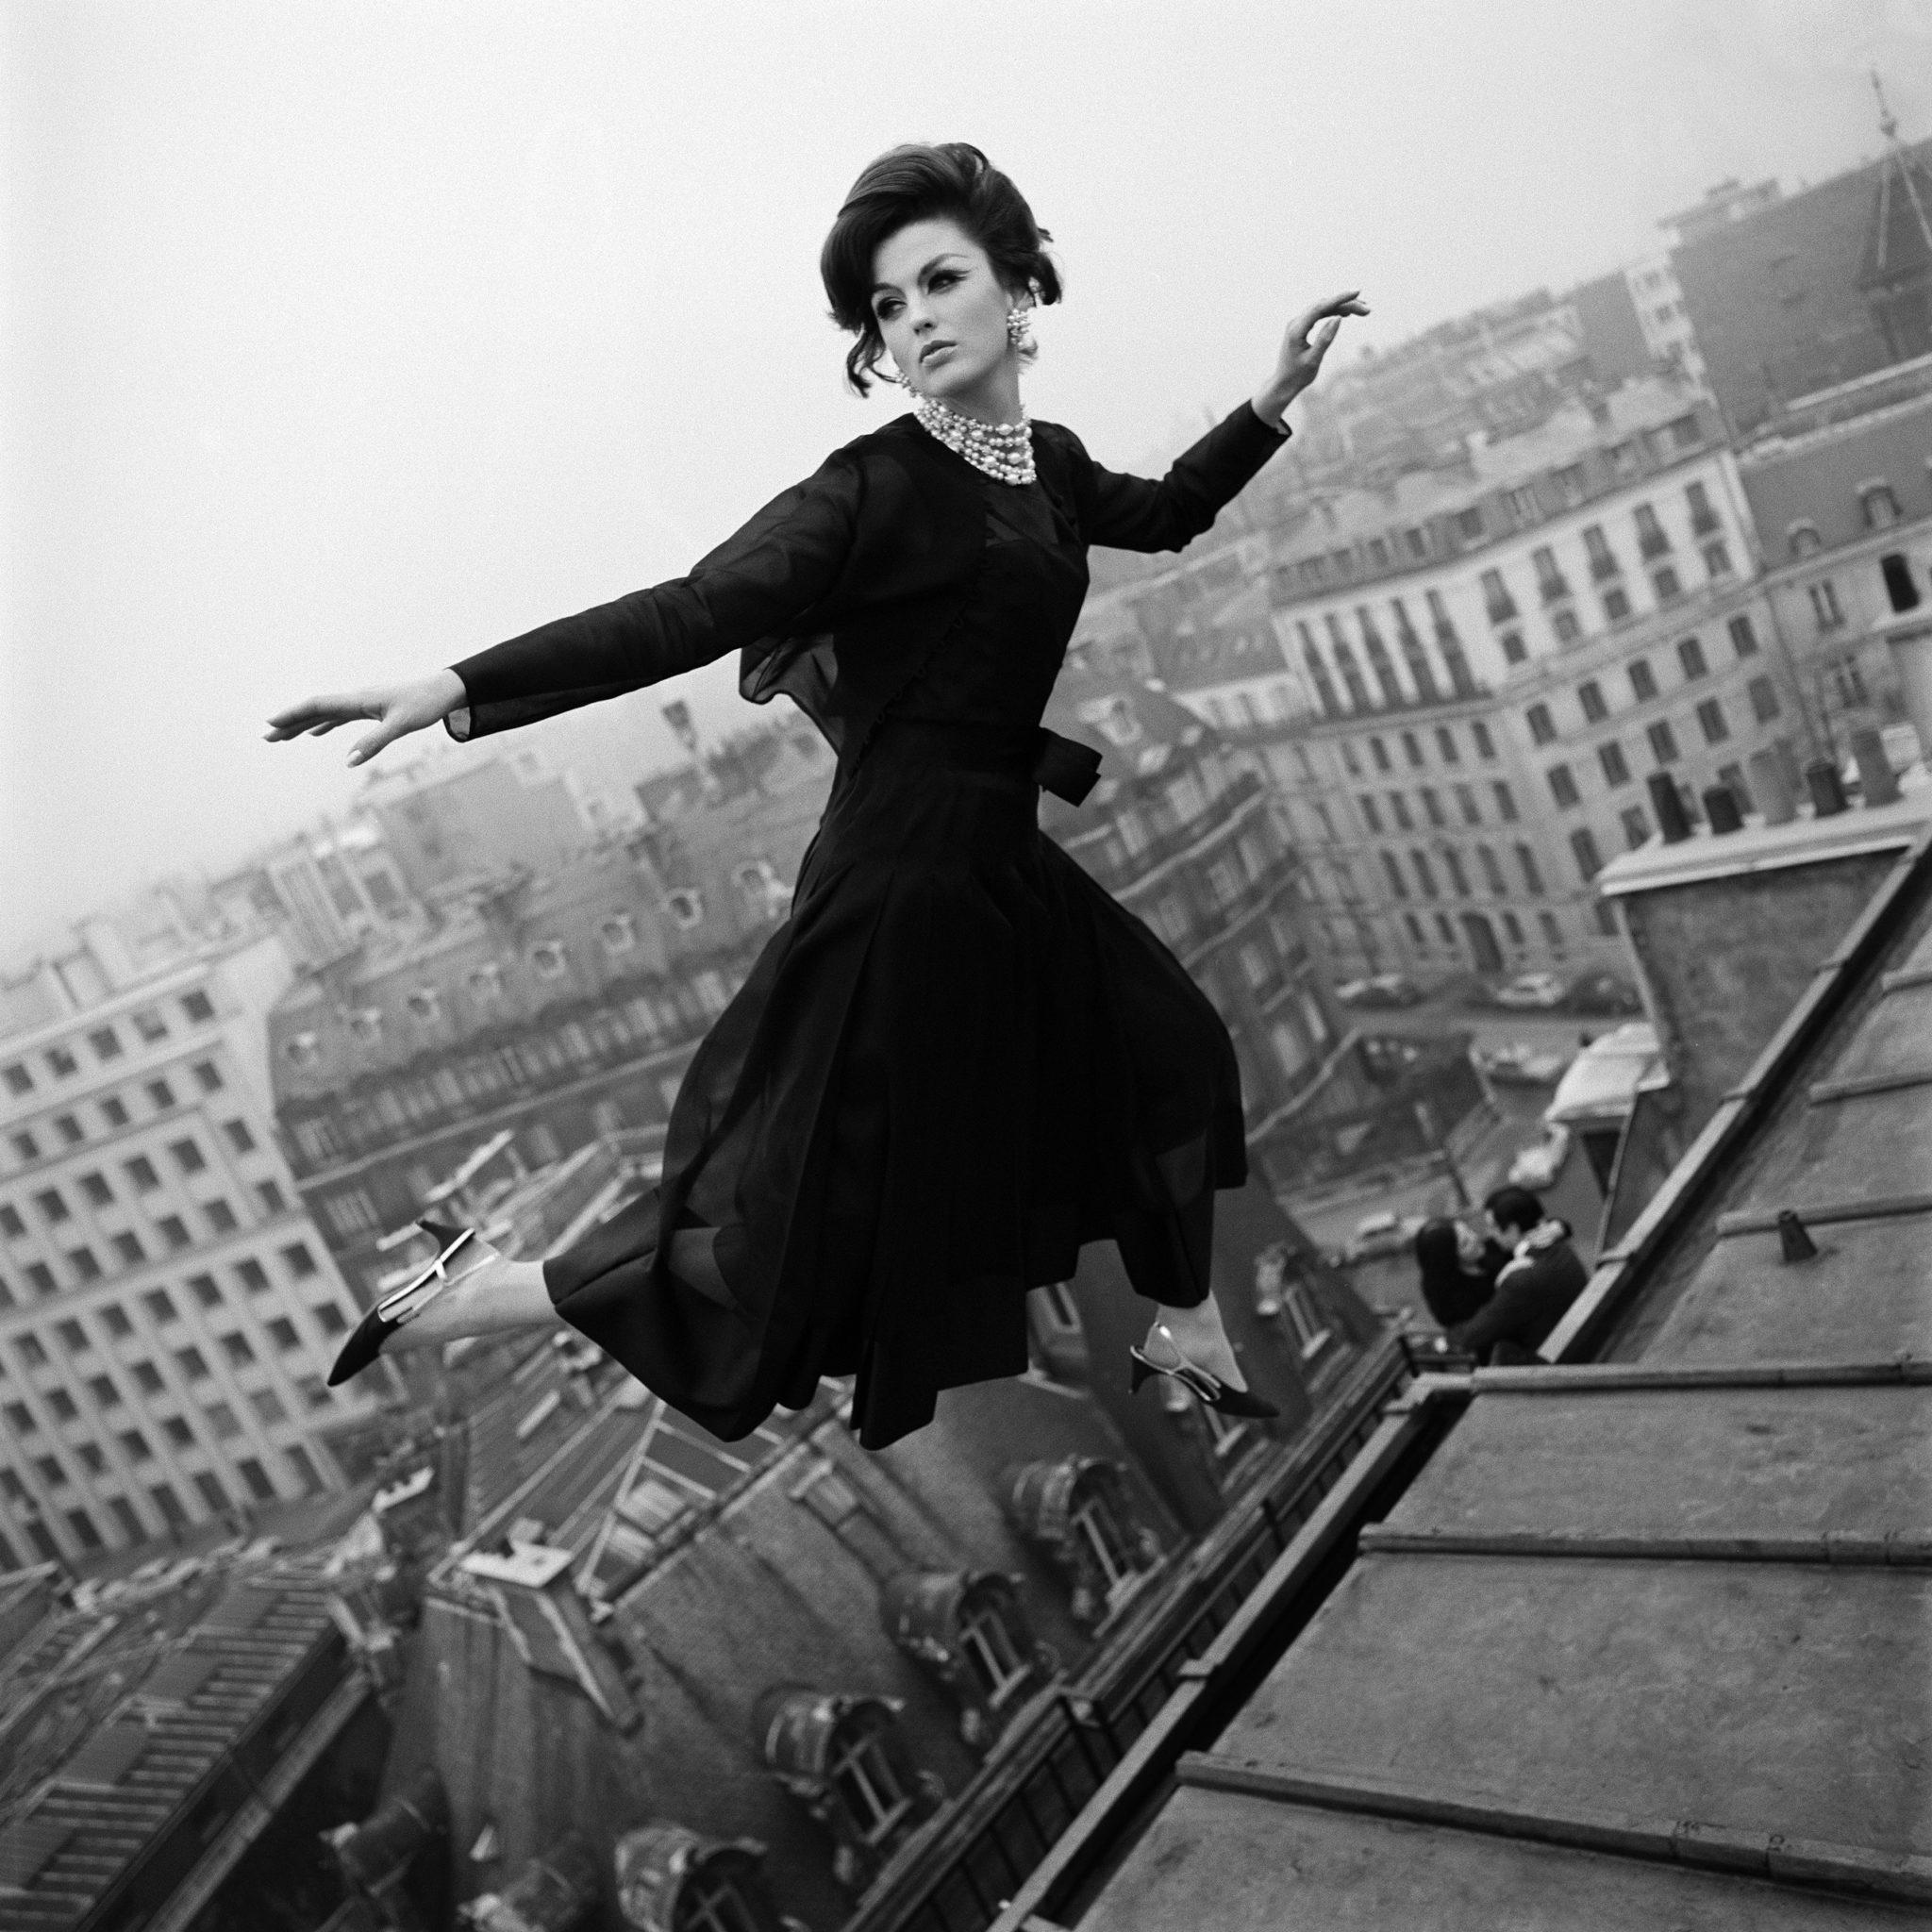 Melvin Sokolsky, Fly Dior, Dorothy McGowan en robe de la collection haute couture printemps-été 1965, Harper's Bazaar, mars 1965 © Melvin Sokolsky